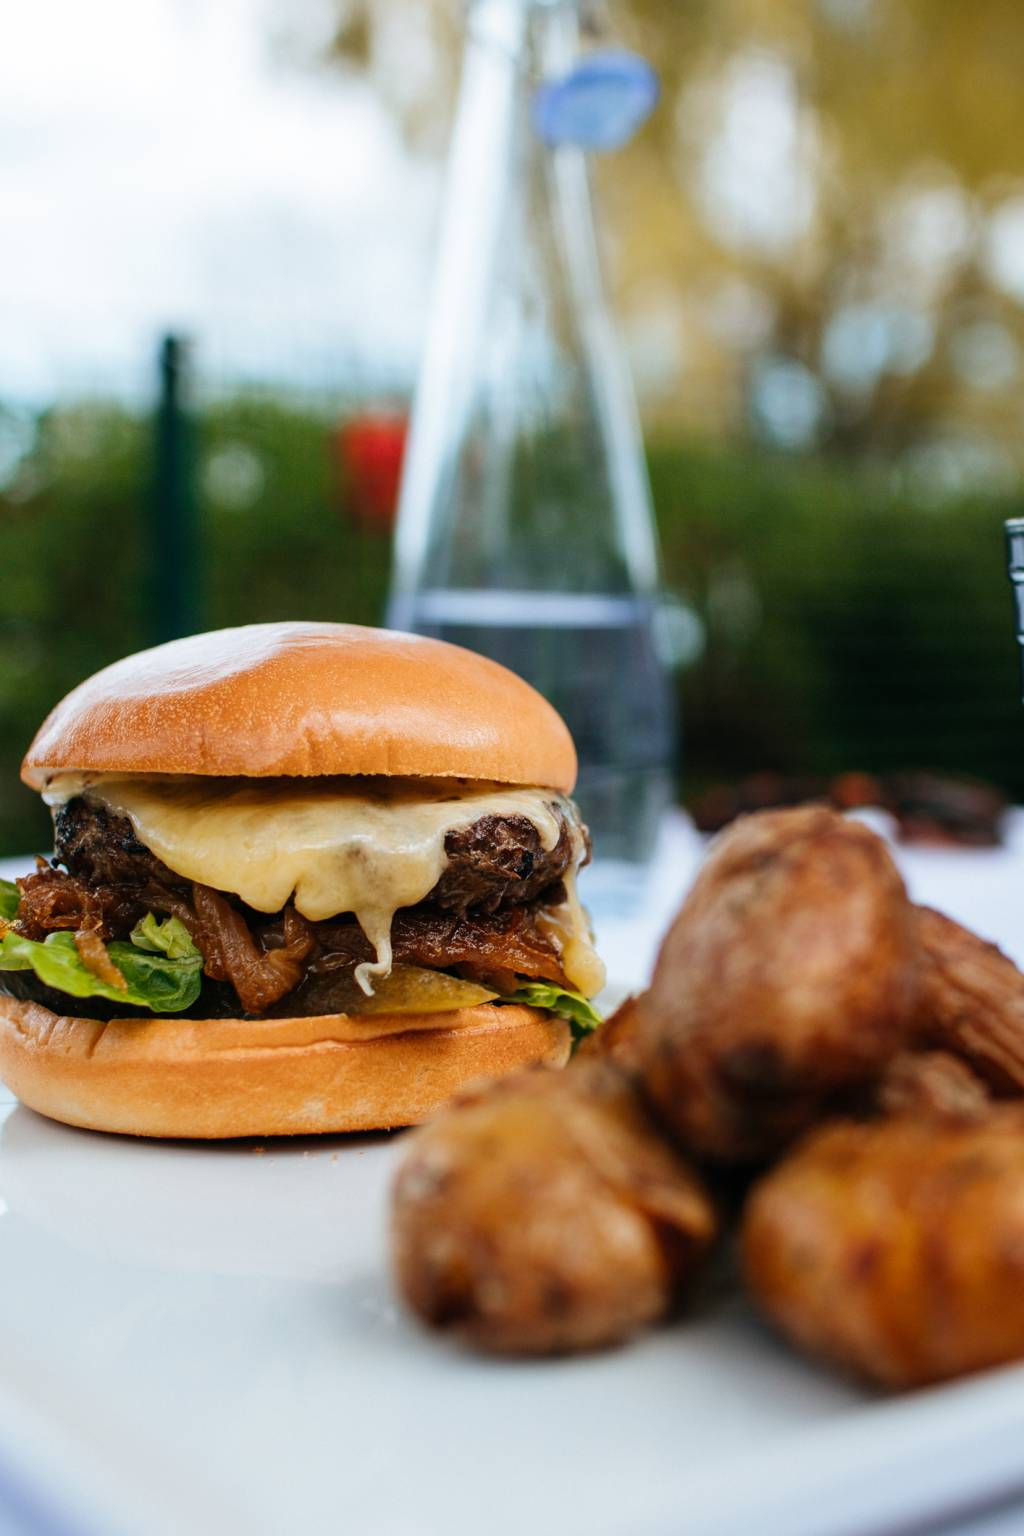 Ravintola Töölönrannan burgeri